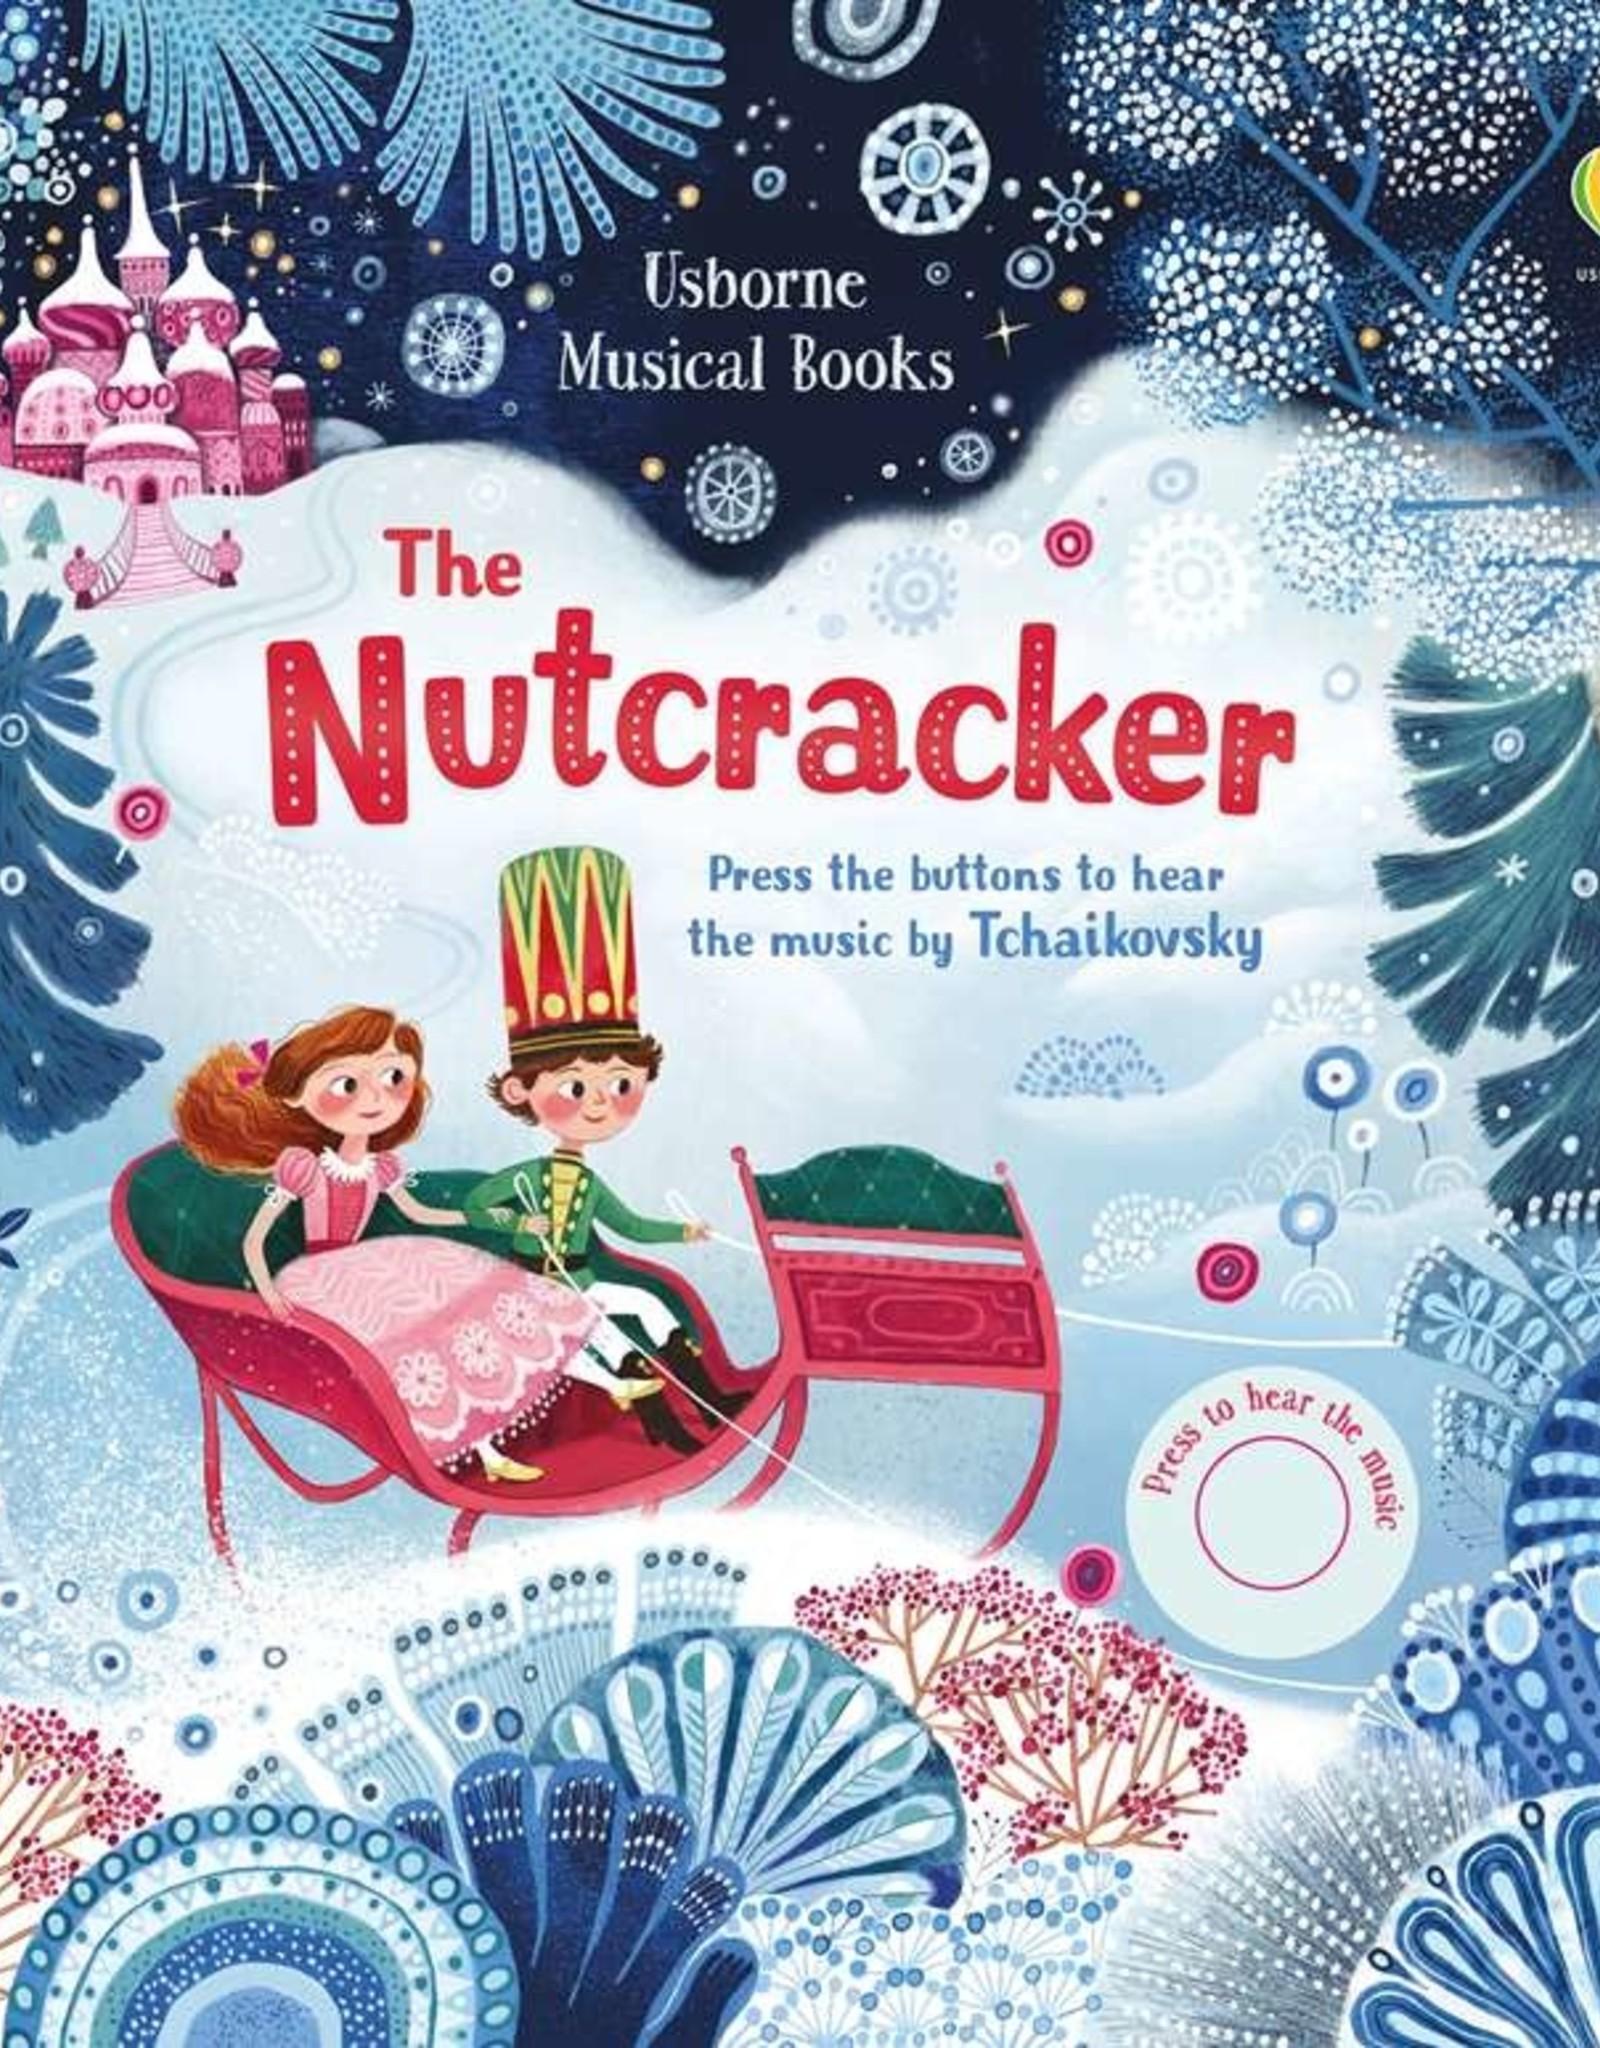 Usborne Musical Books - The Nutcracker